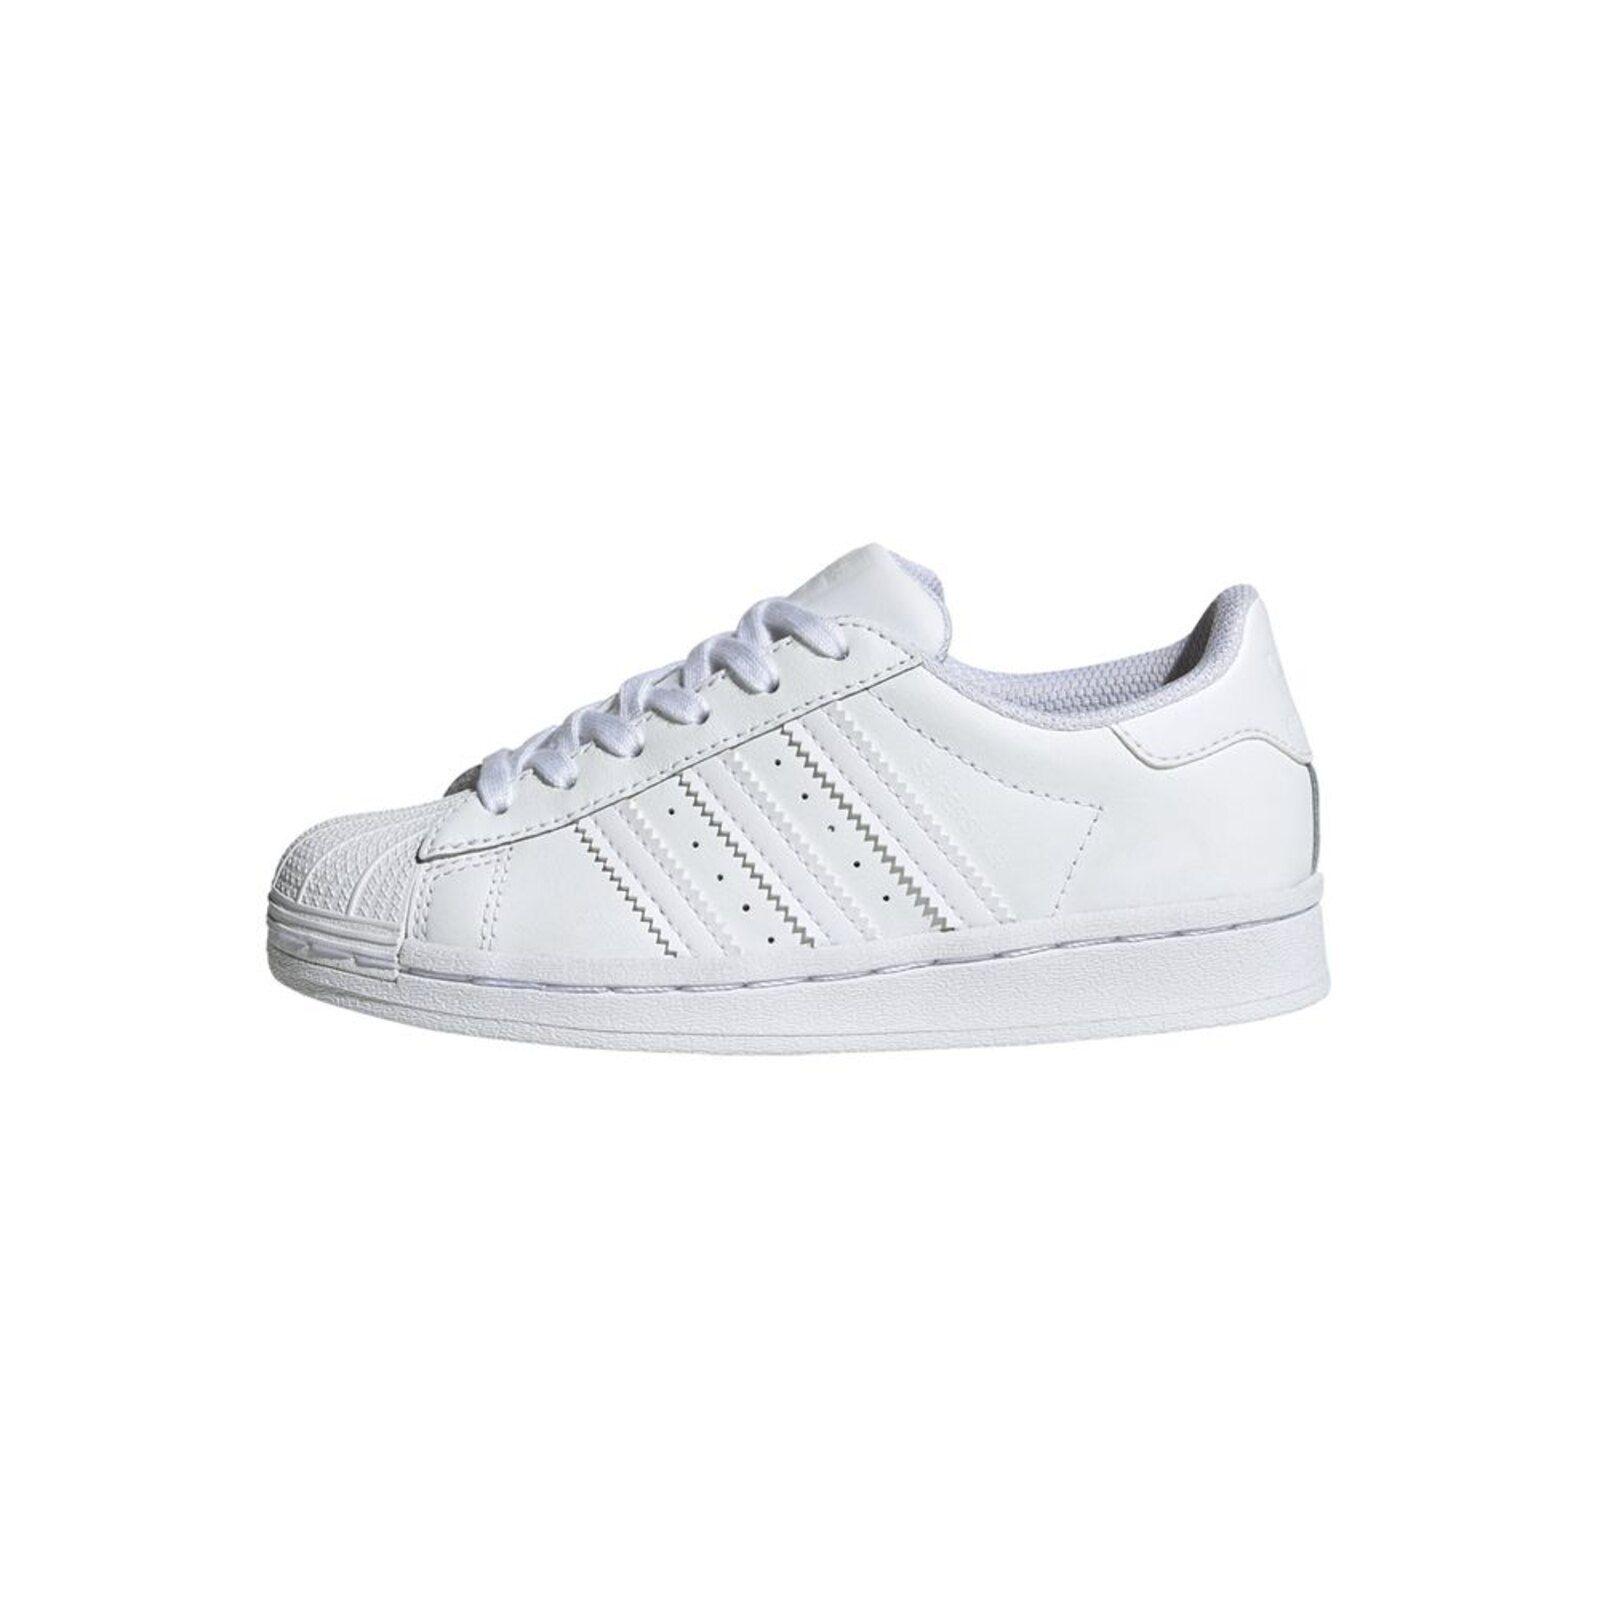 Tenis Adidas Superstar Branco em 2020 | Tenis adidas